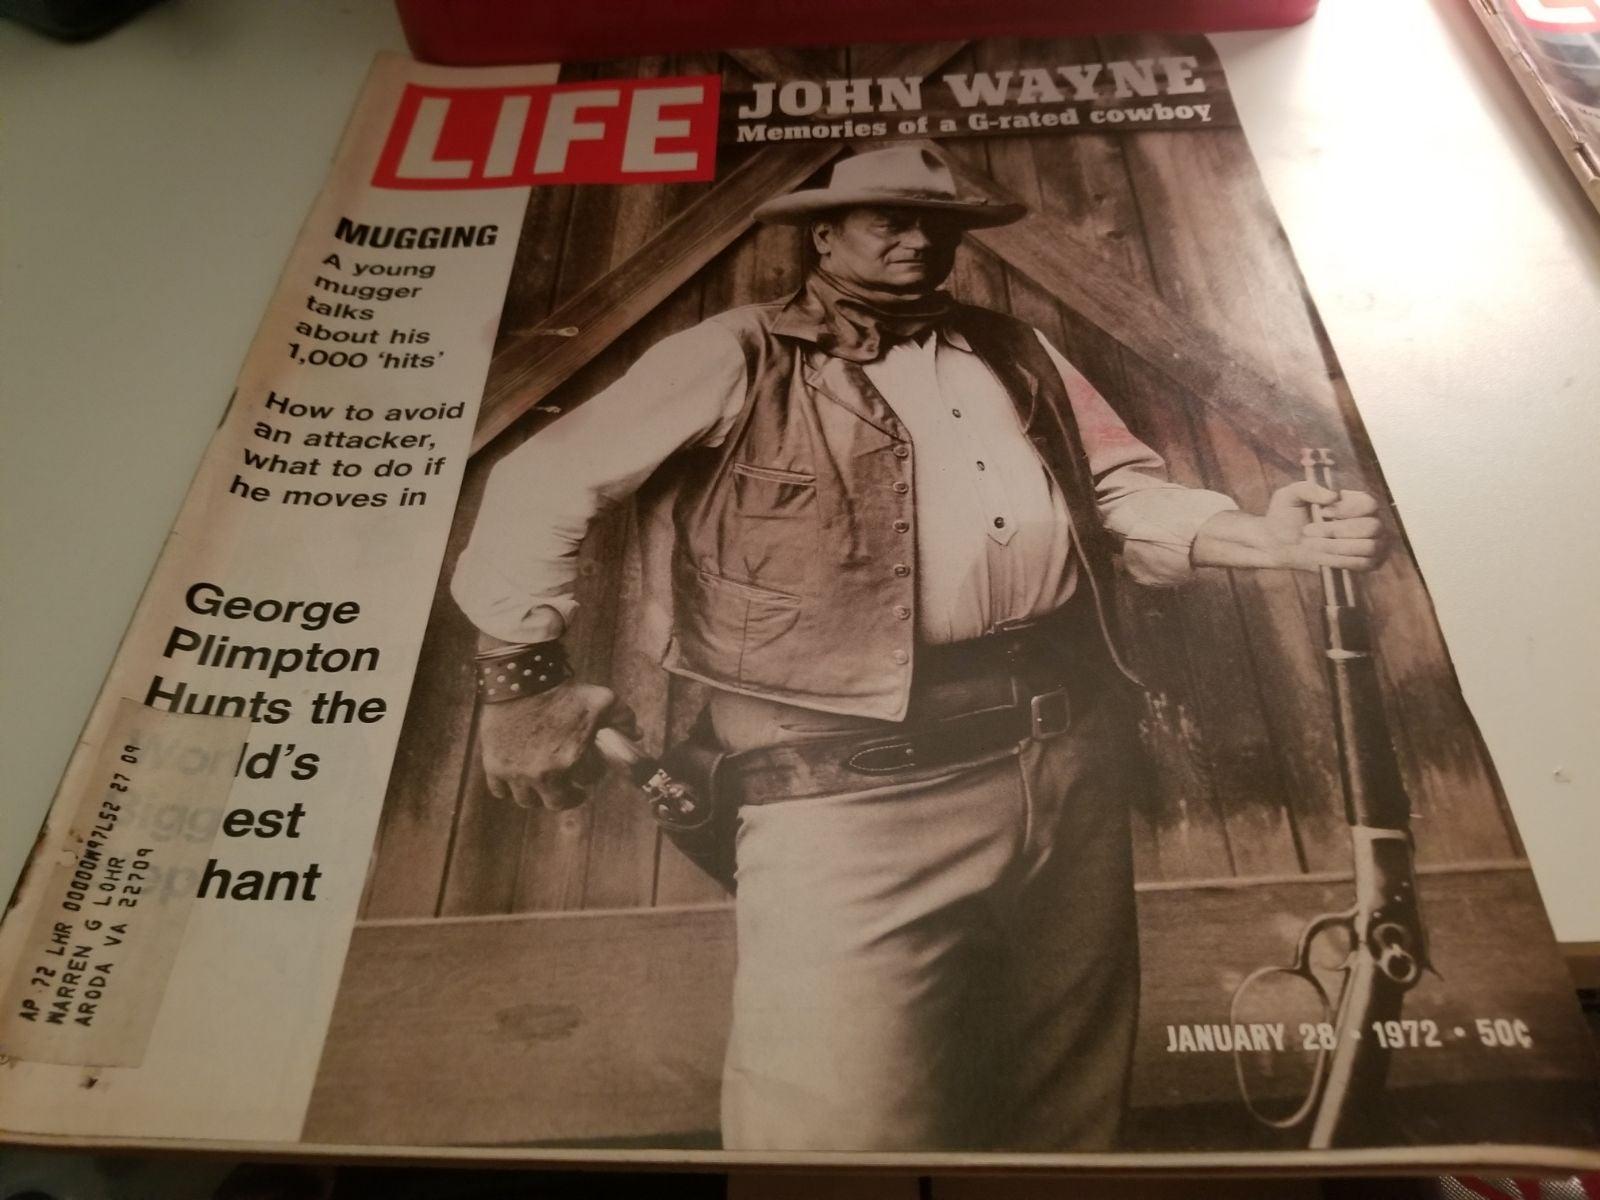 John wayne vintage life magazine